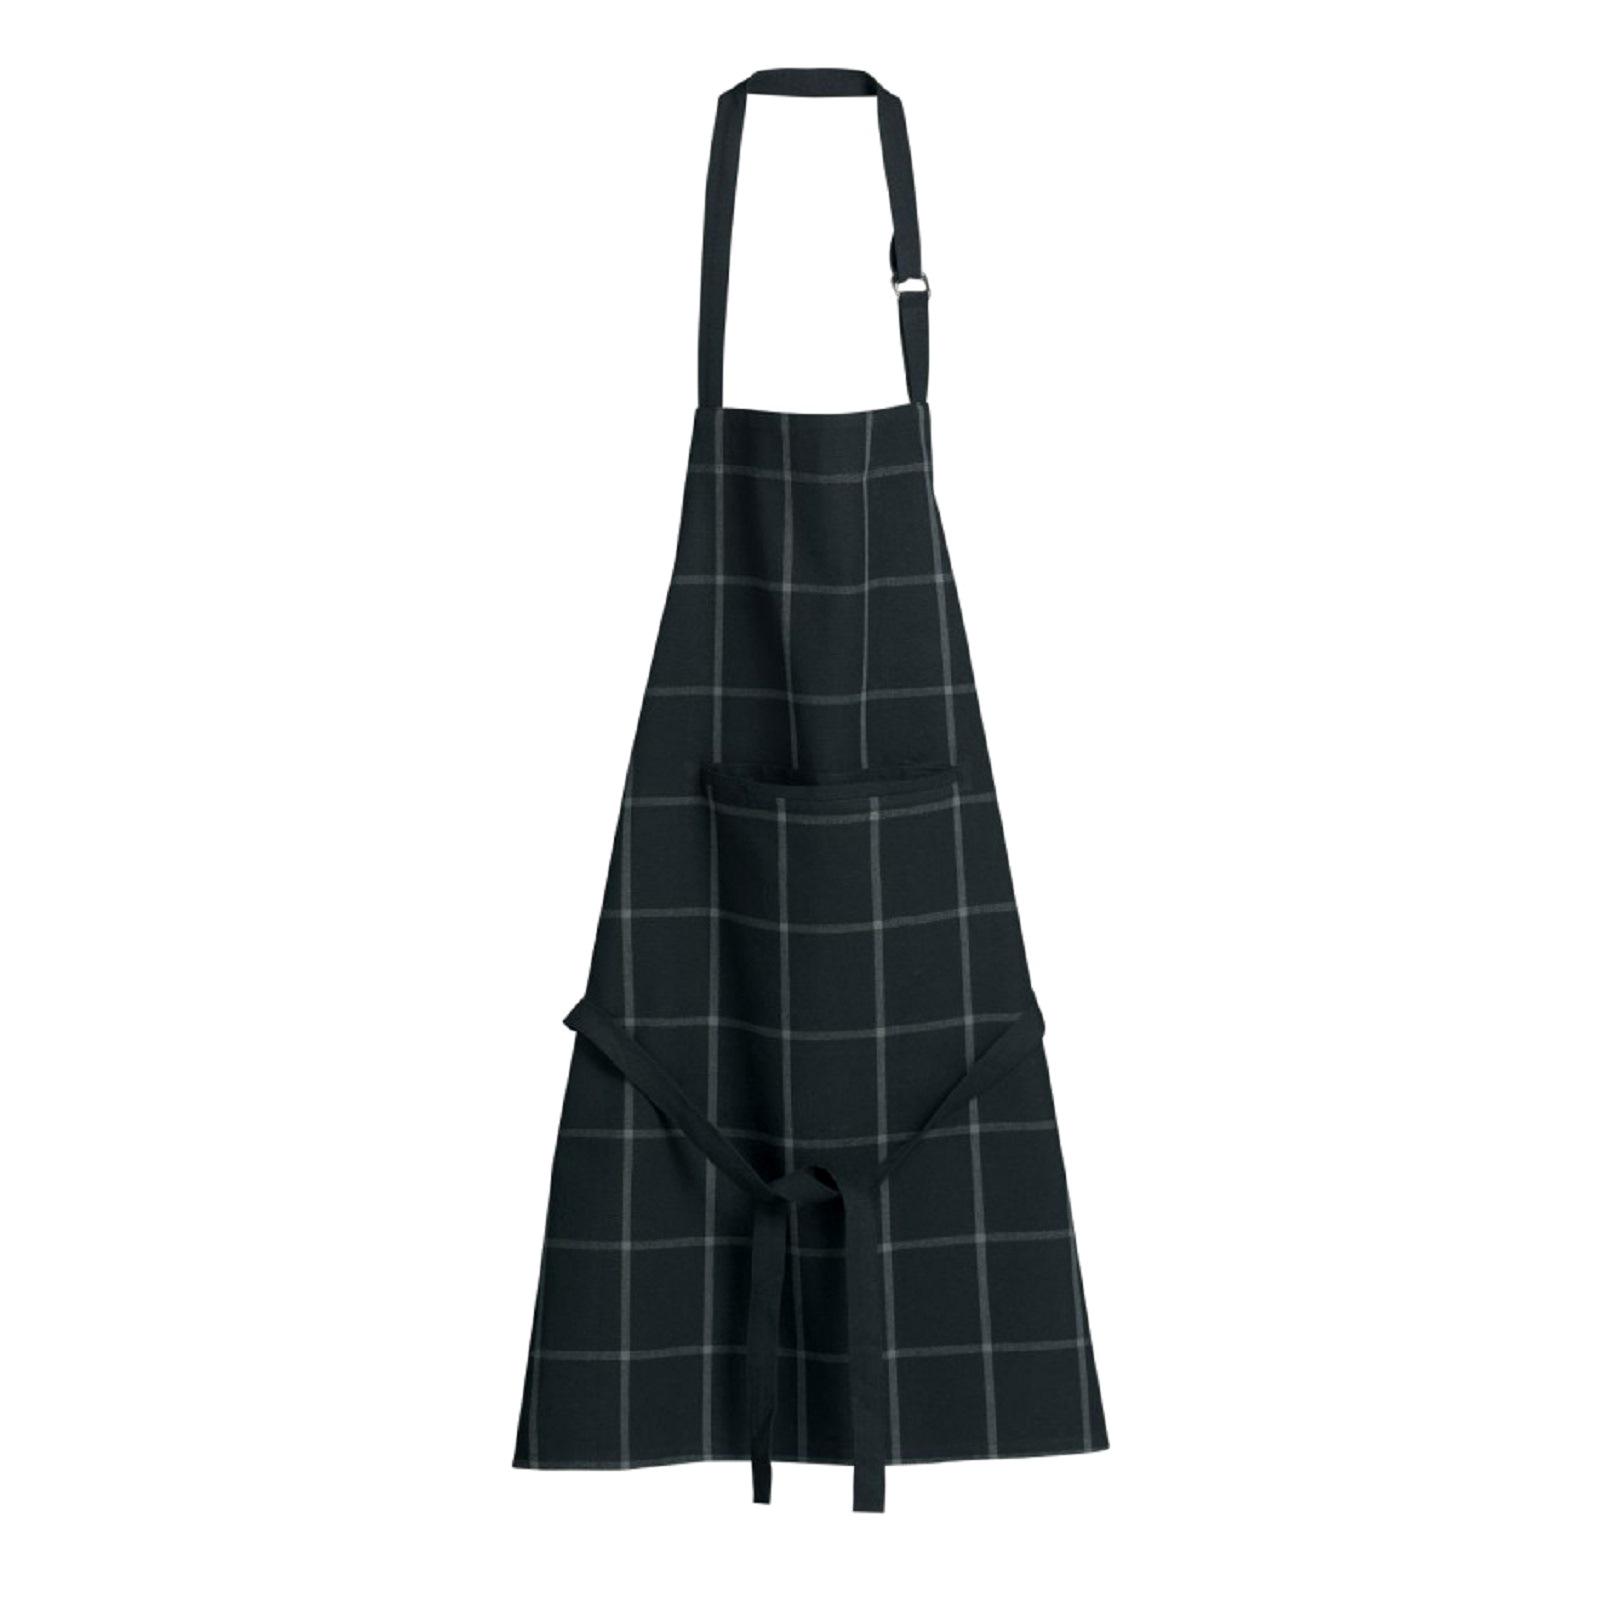 Онлайн каталог PROMENU: Фартук Winkler DOHA, размеры 80 х 85 см, черный Winkler 3720079000